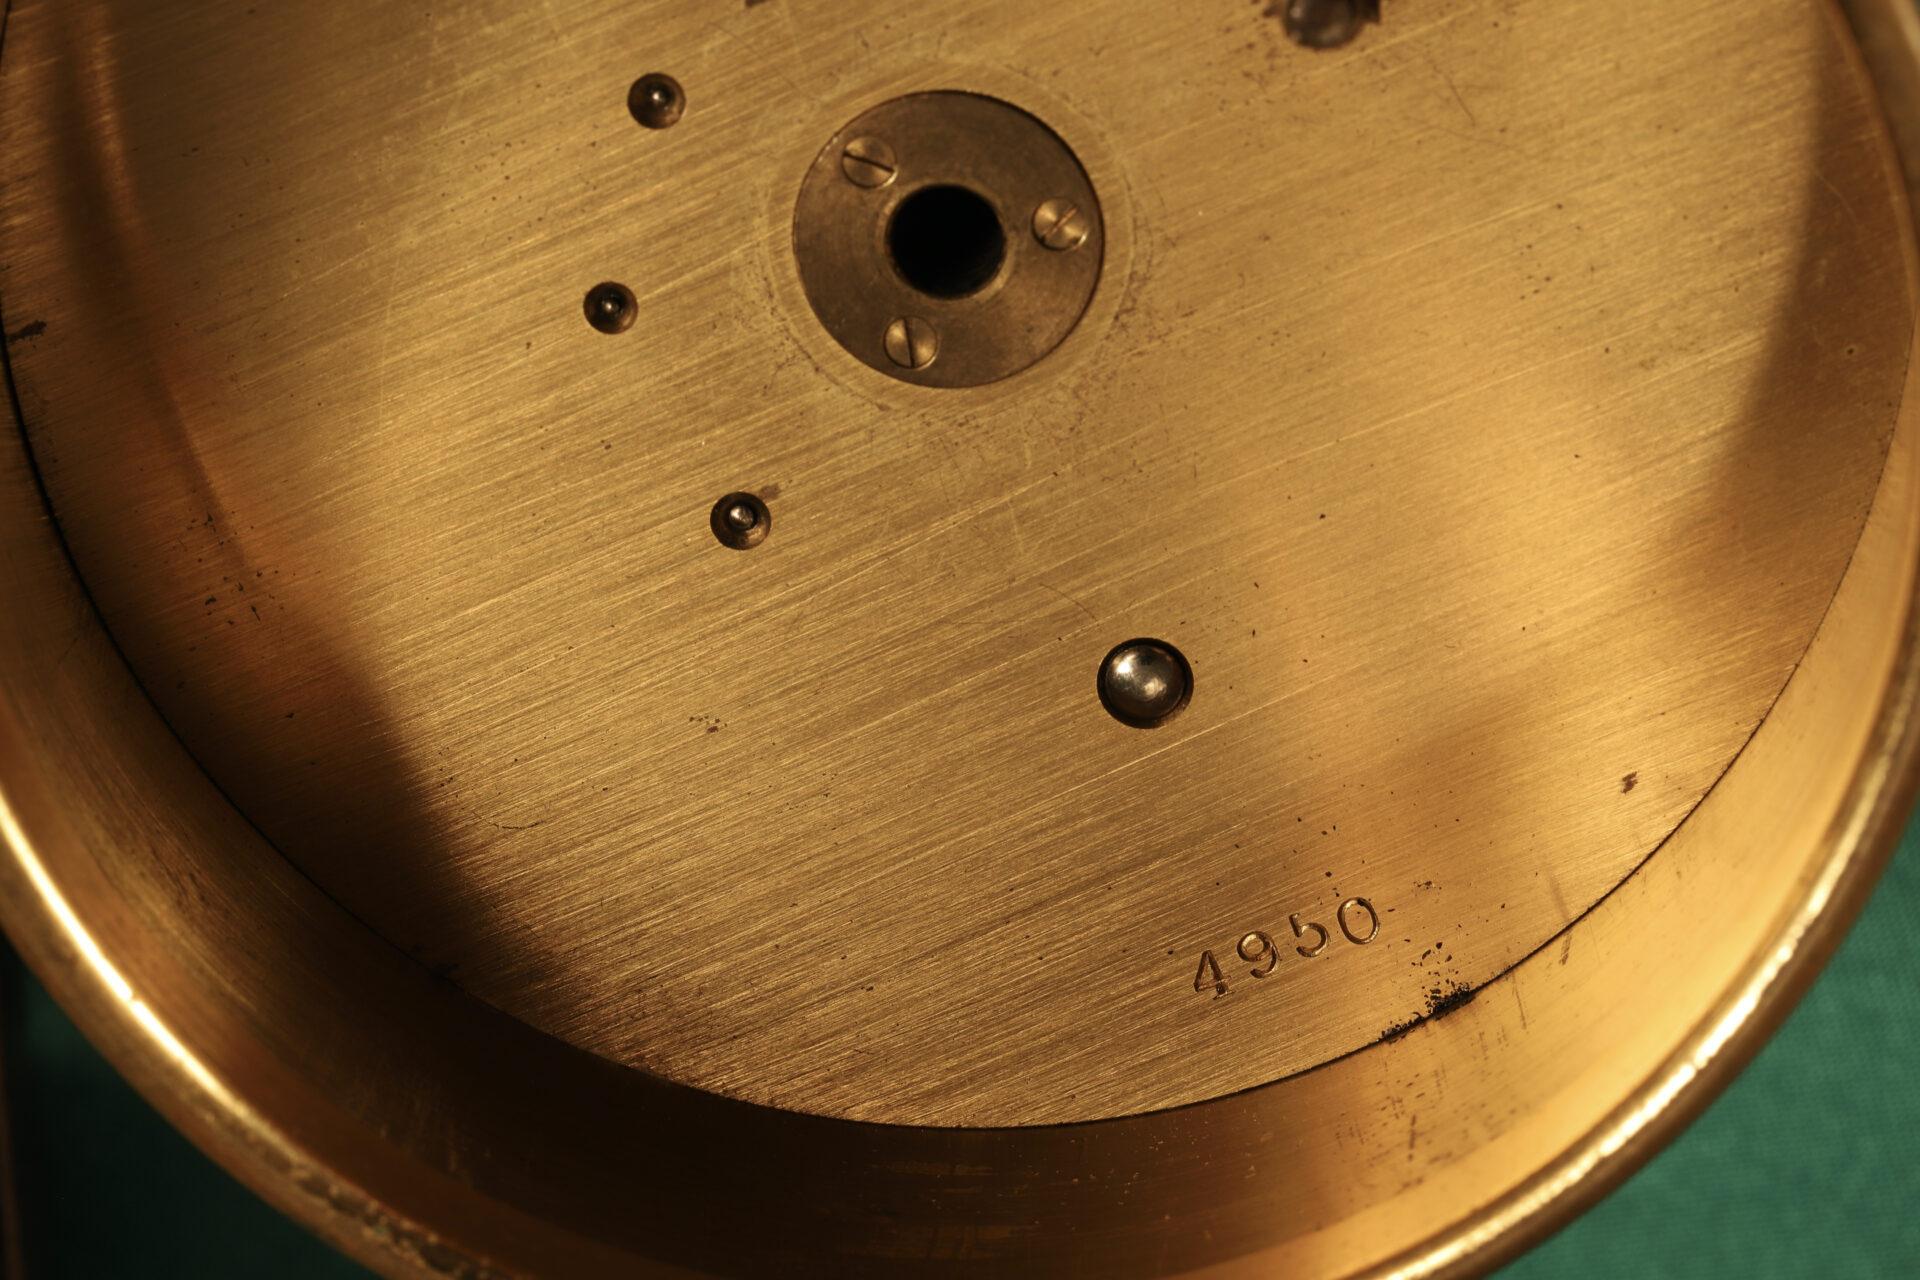 Close up of Short & Mason Barograph No L13629 c1930 showing drum serial number